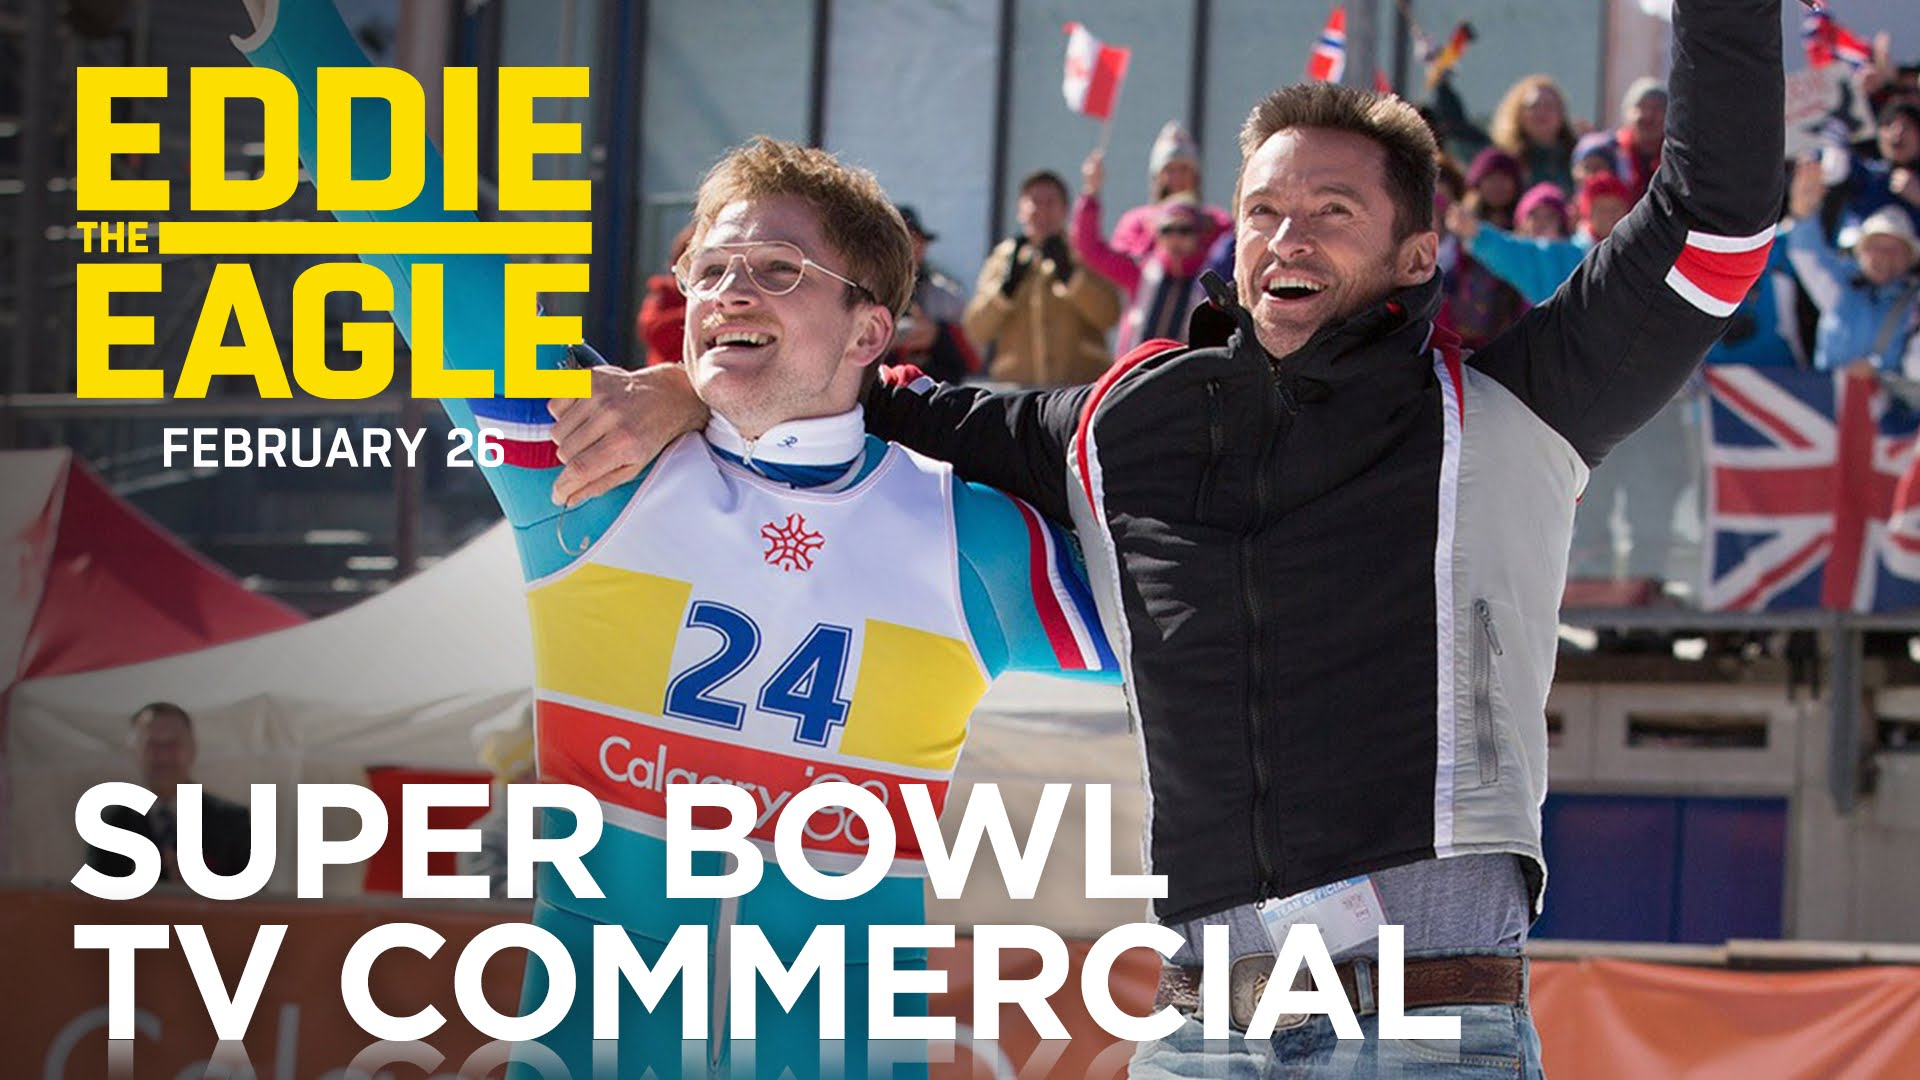 Eddie the Eagle | Super Bowl TV Commercial | 20th Century FOX